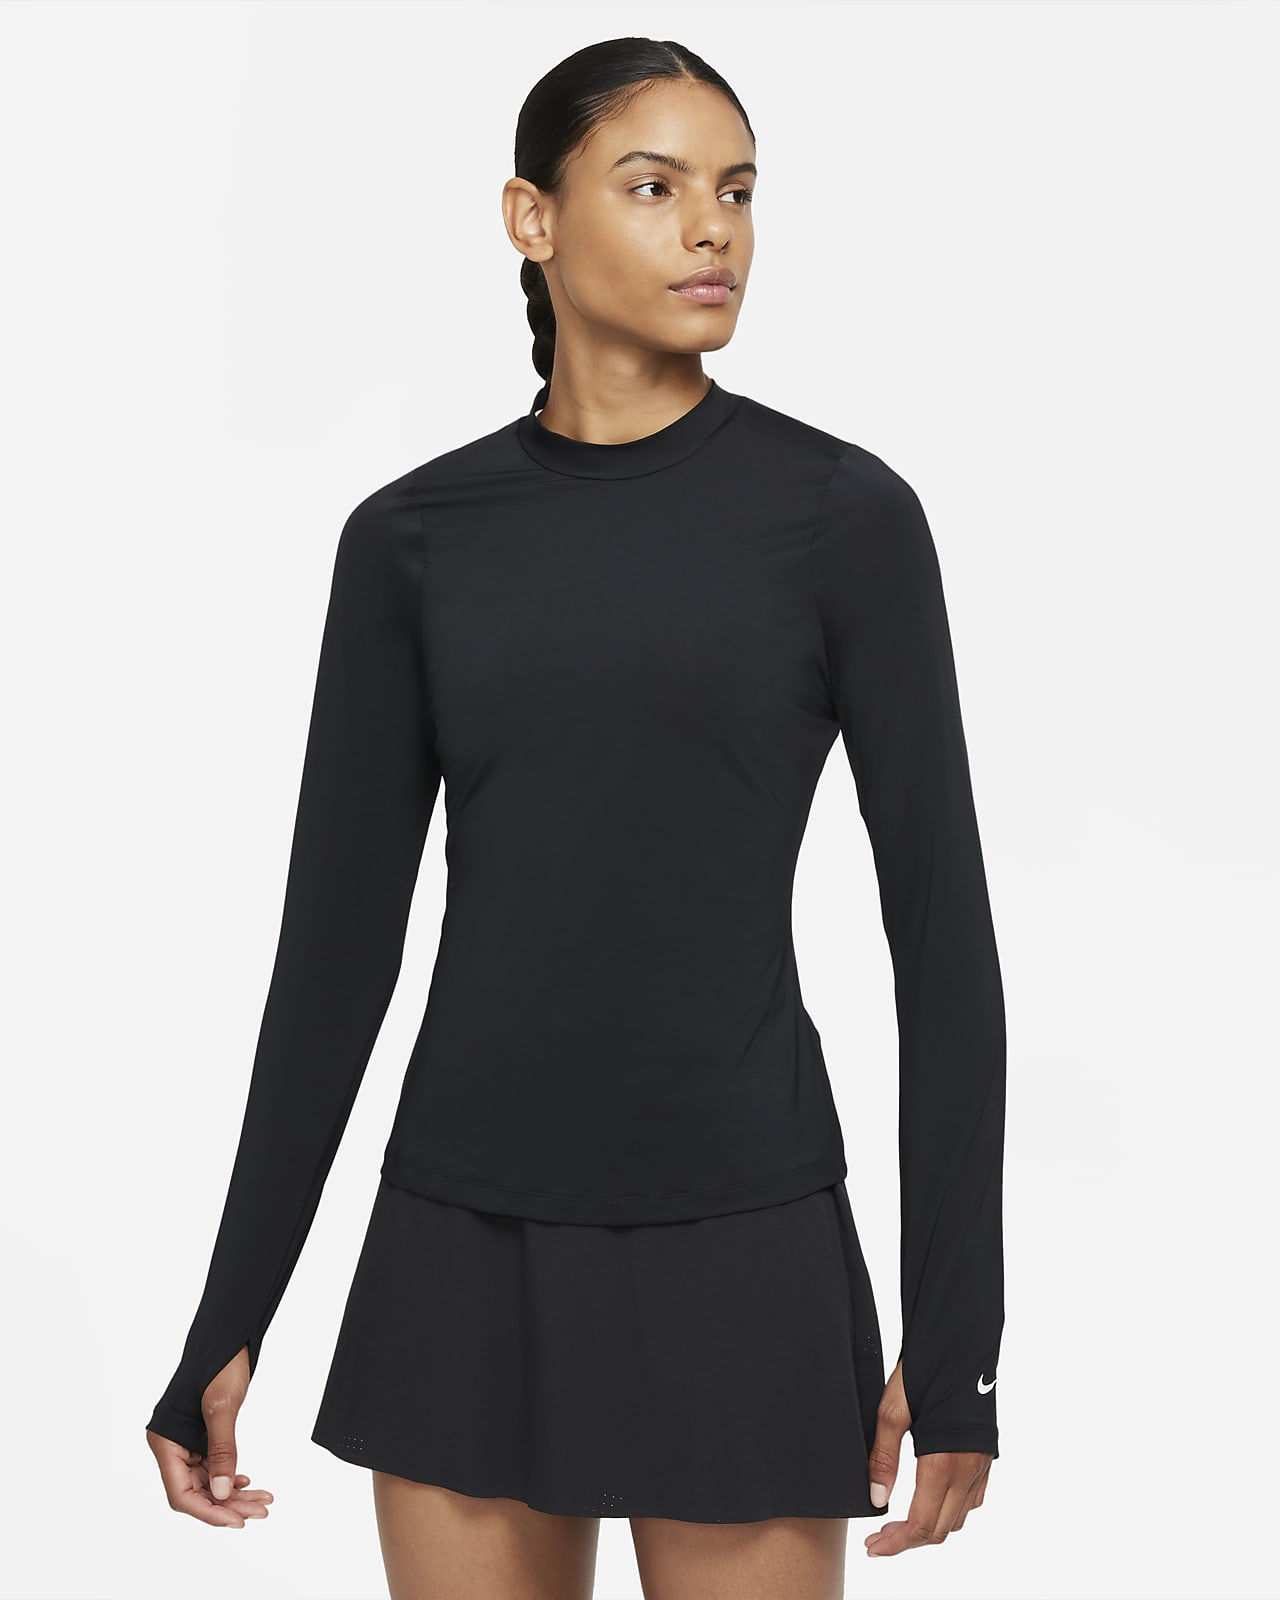 Dámské golfové tričko Nike Dri-FIT UV Victory s dlouhým rukávem